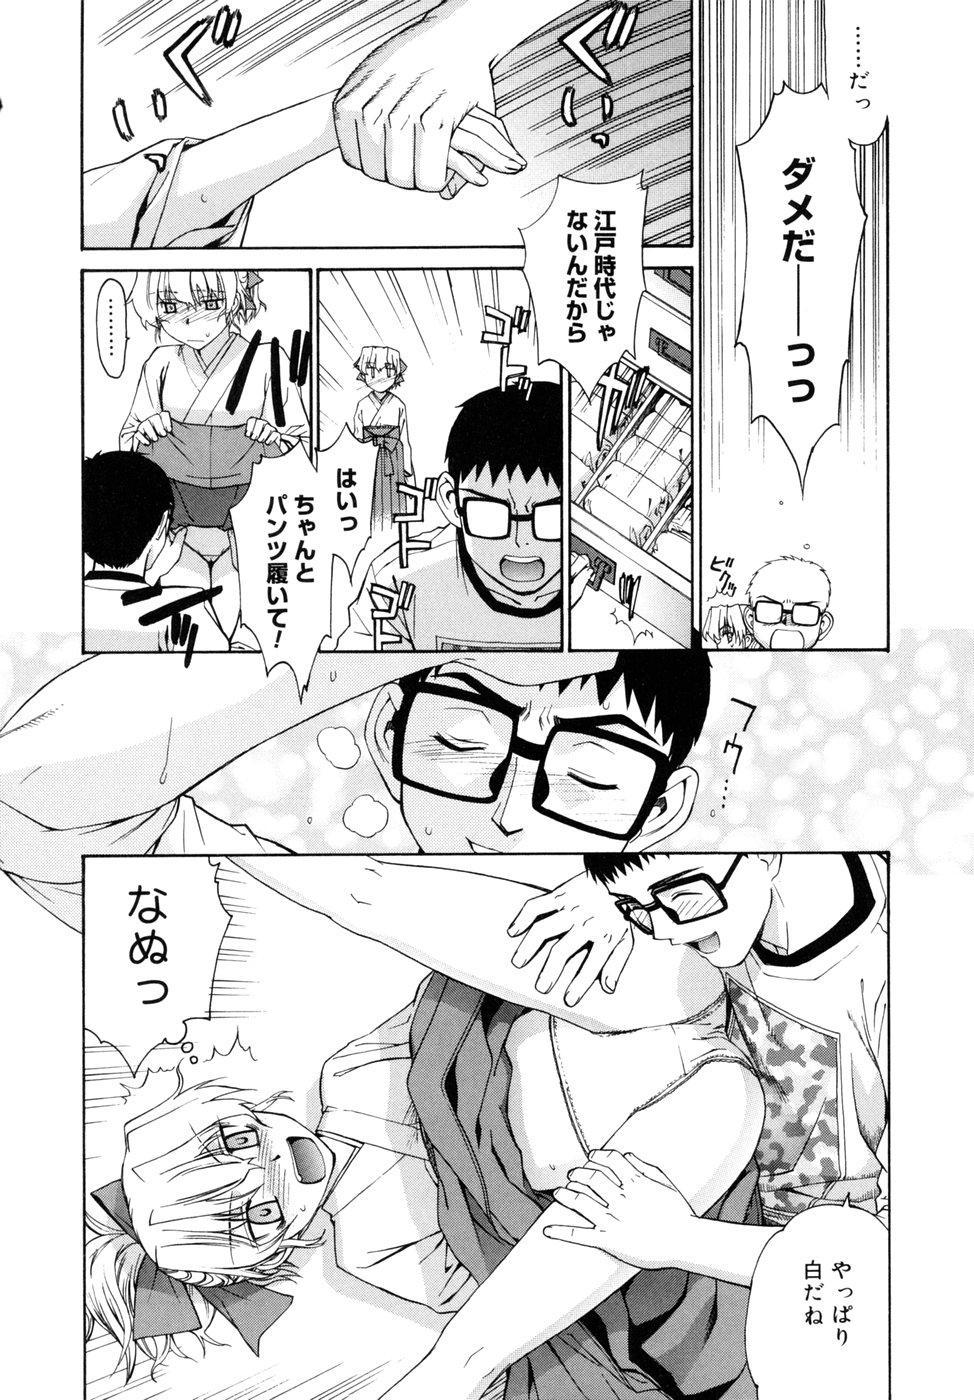 [Yaya Hinata] Tonari no Miko-san wa Minna Warau - The next shrine maidens smile in everyone. 133